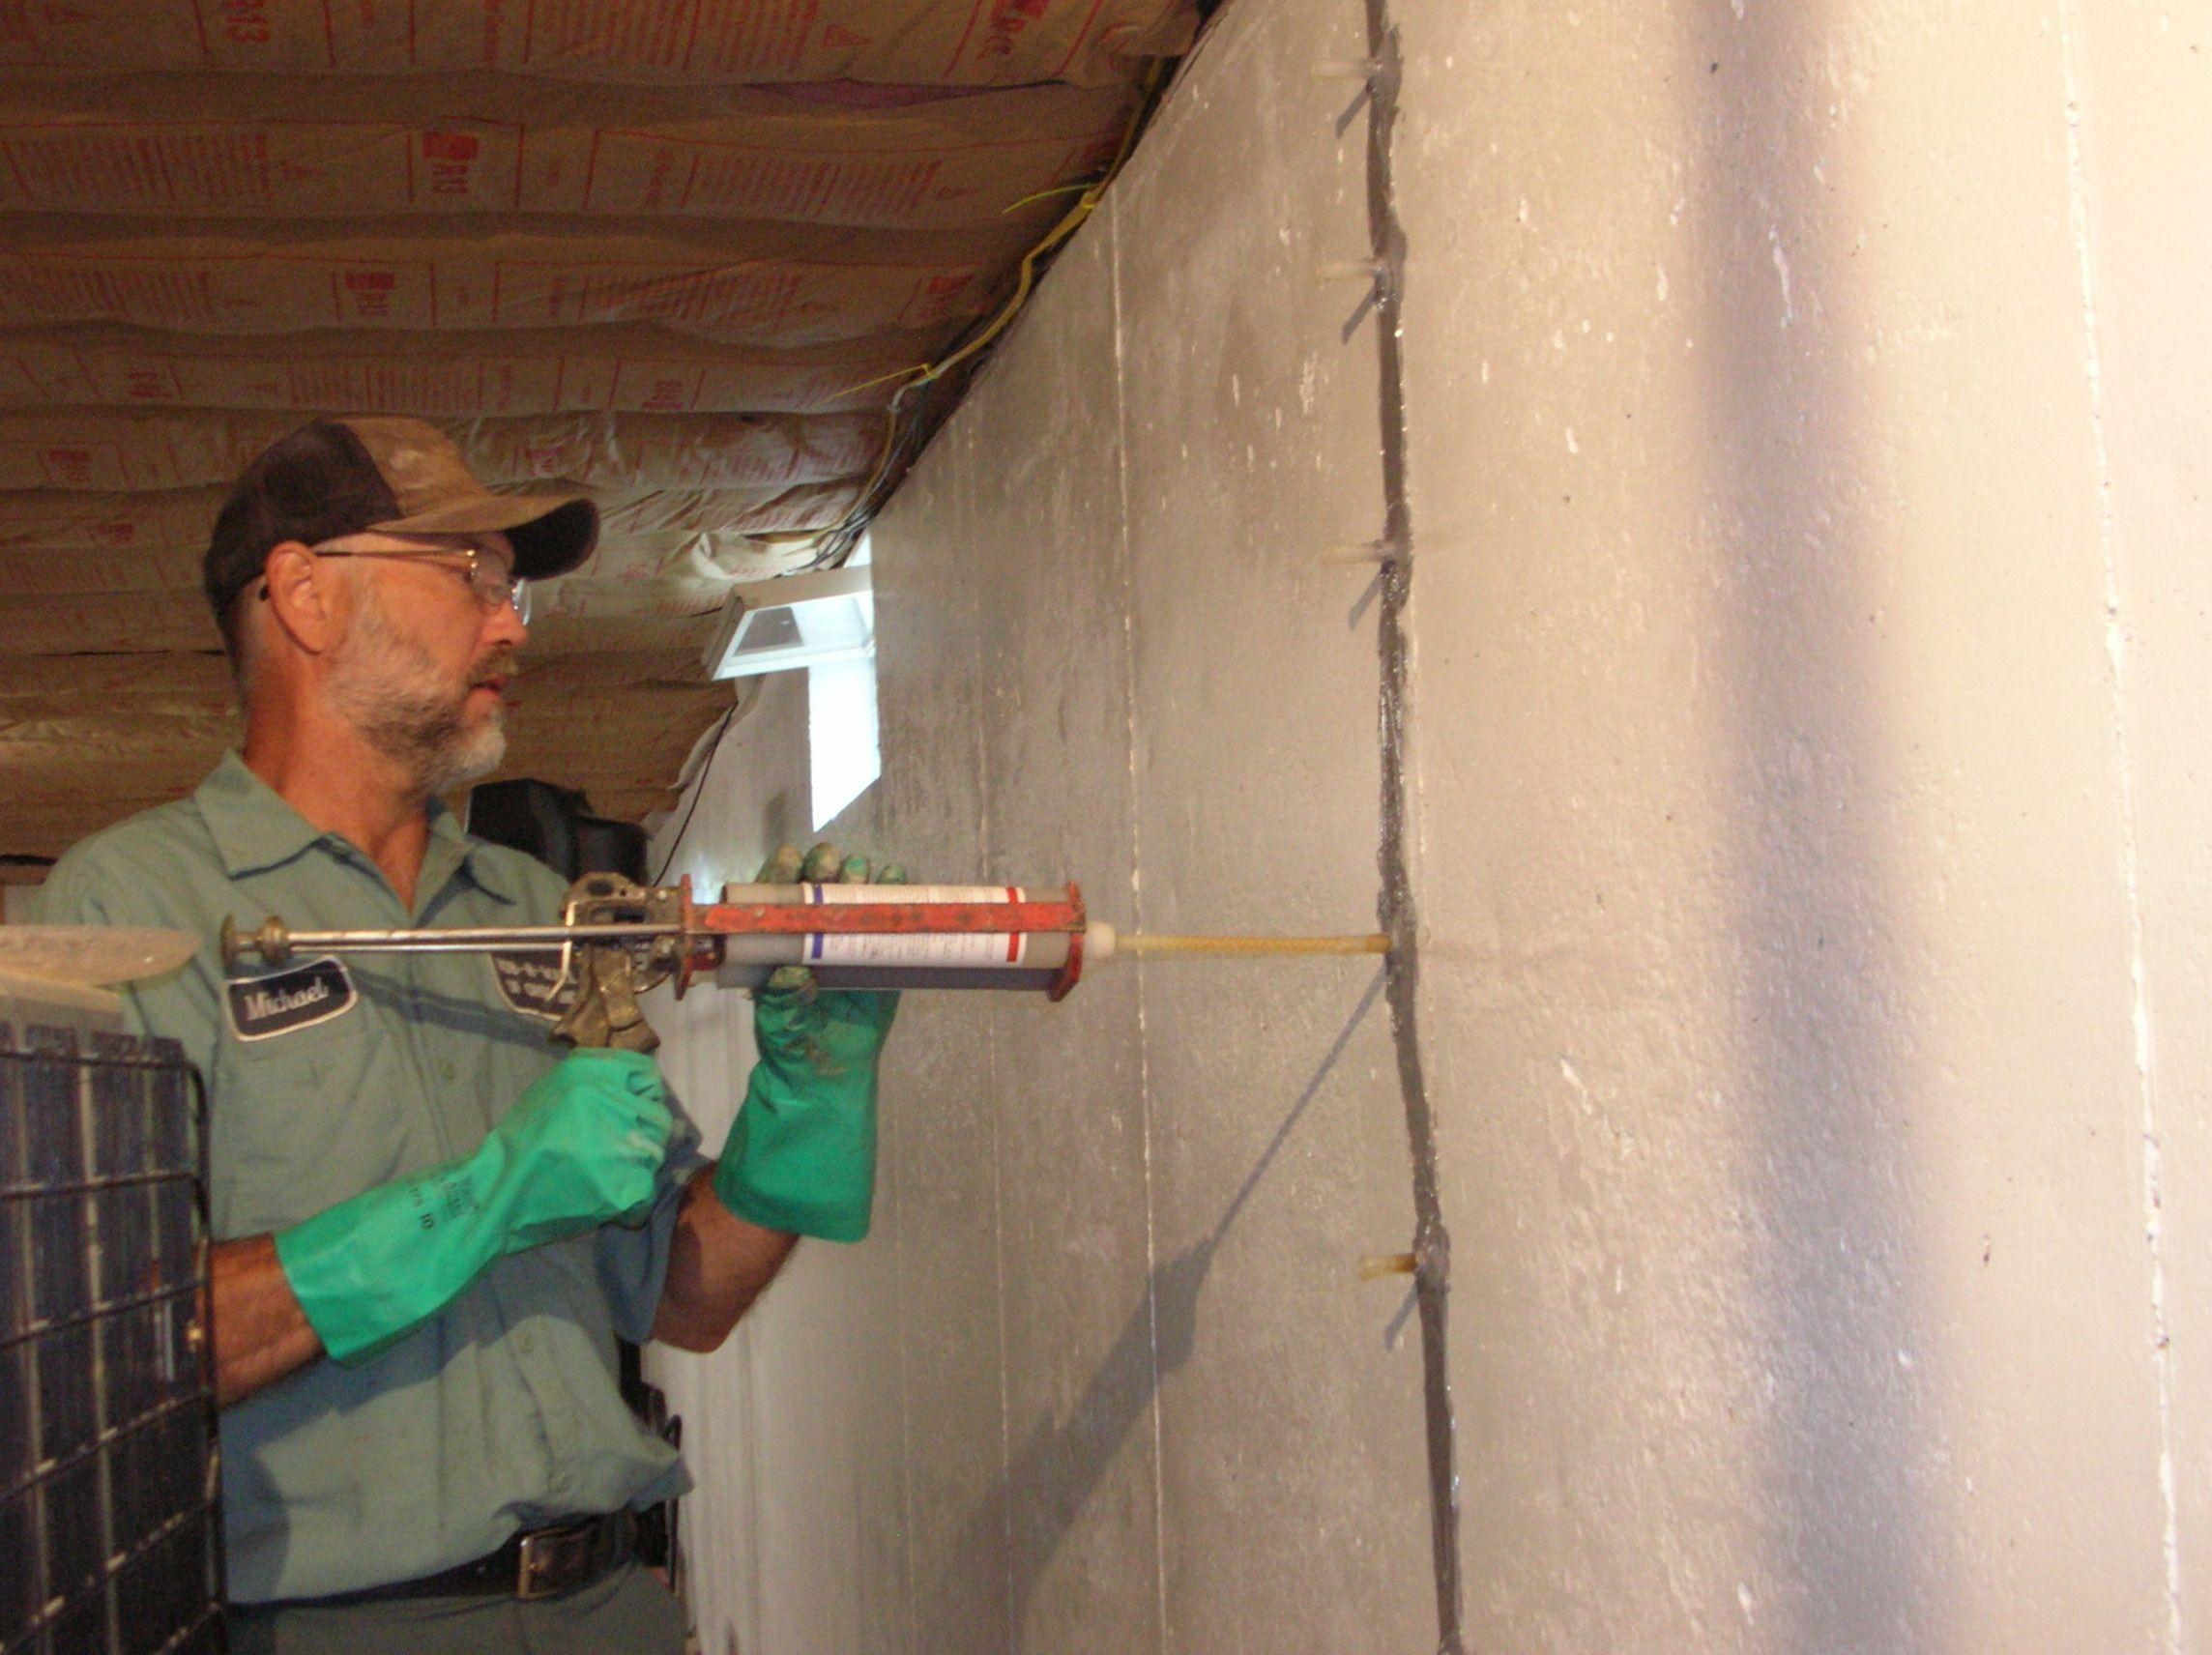 Fixing Basement Wall Cracks From Inside Basement Walls Basement Contractors Basement